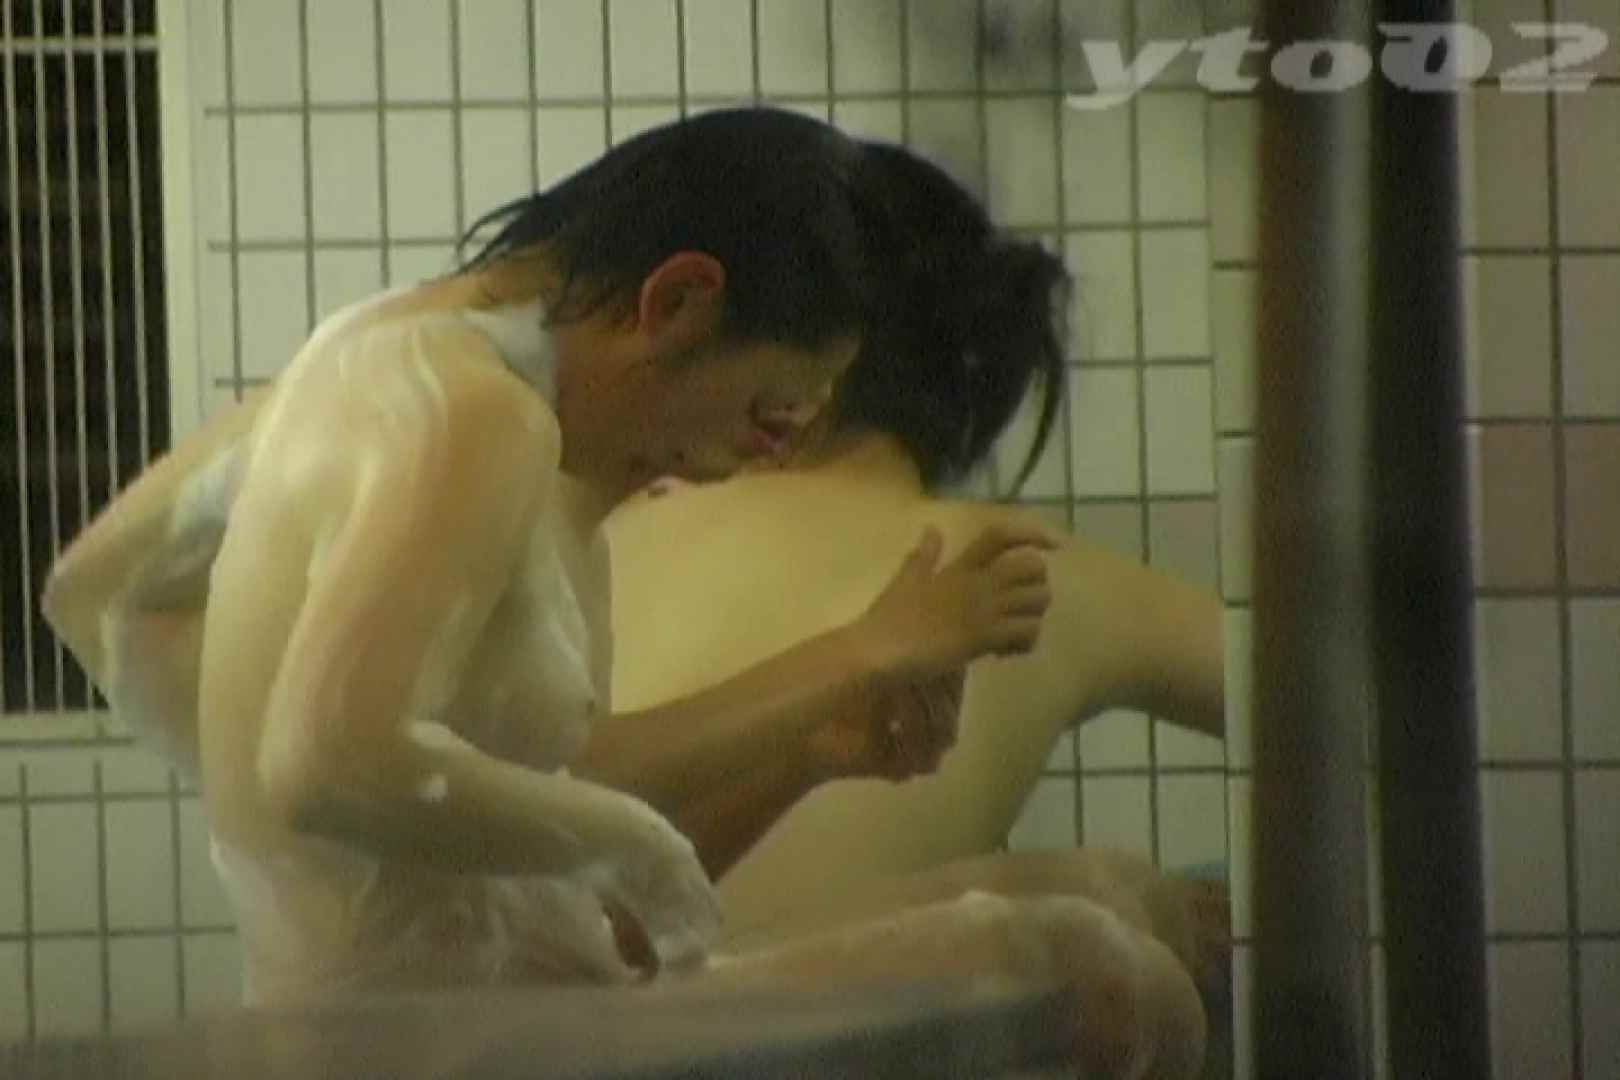 ▲復活限定▲合宿ホテル女風呂盗撮 Vol.11 入浴  79pic 15